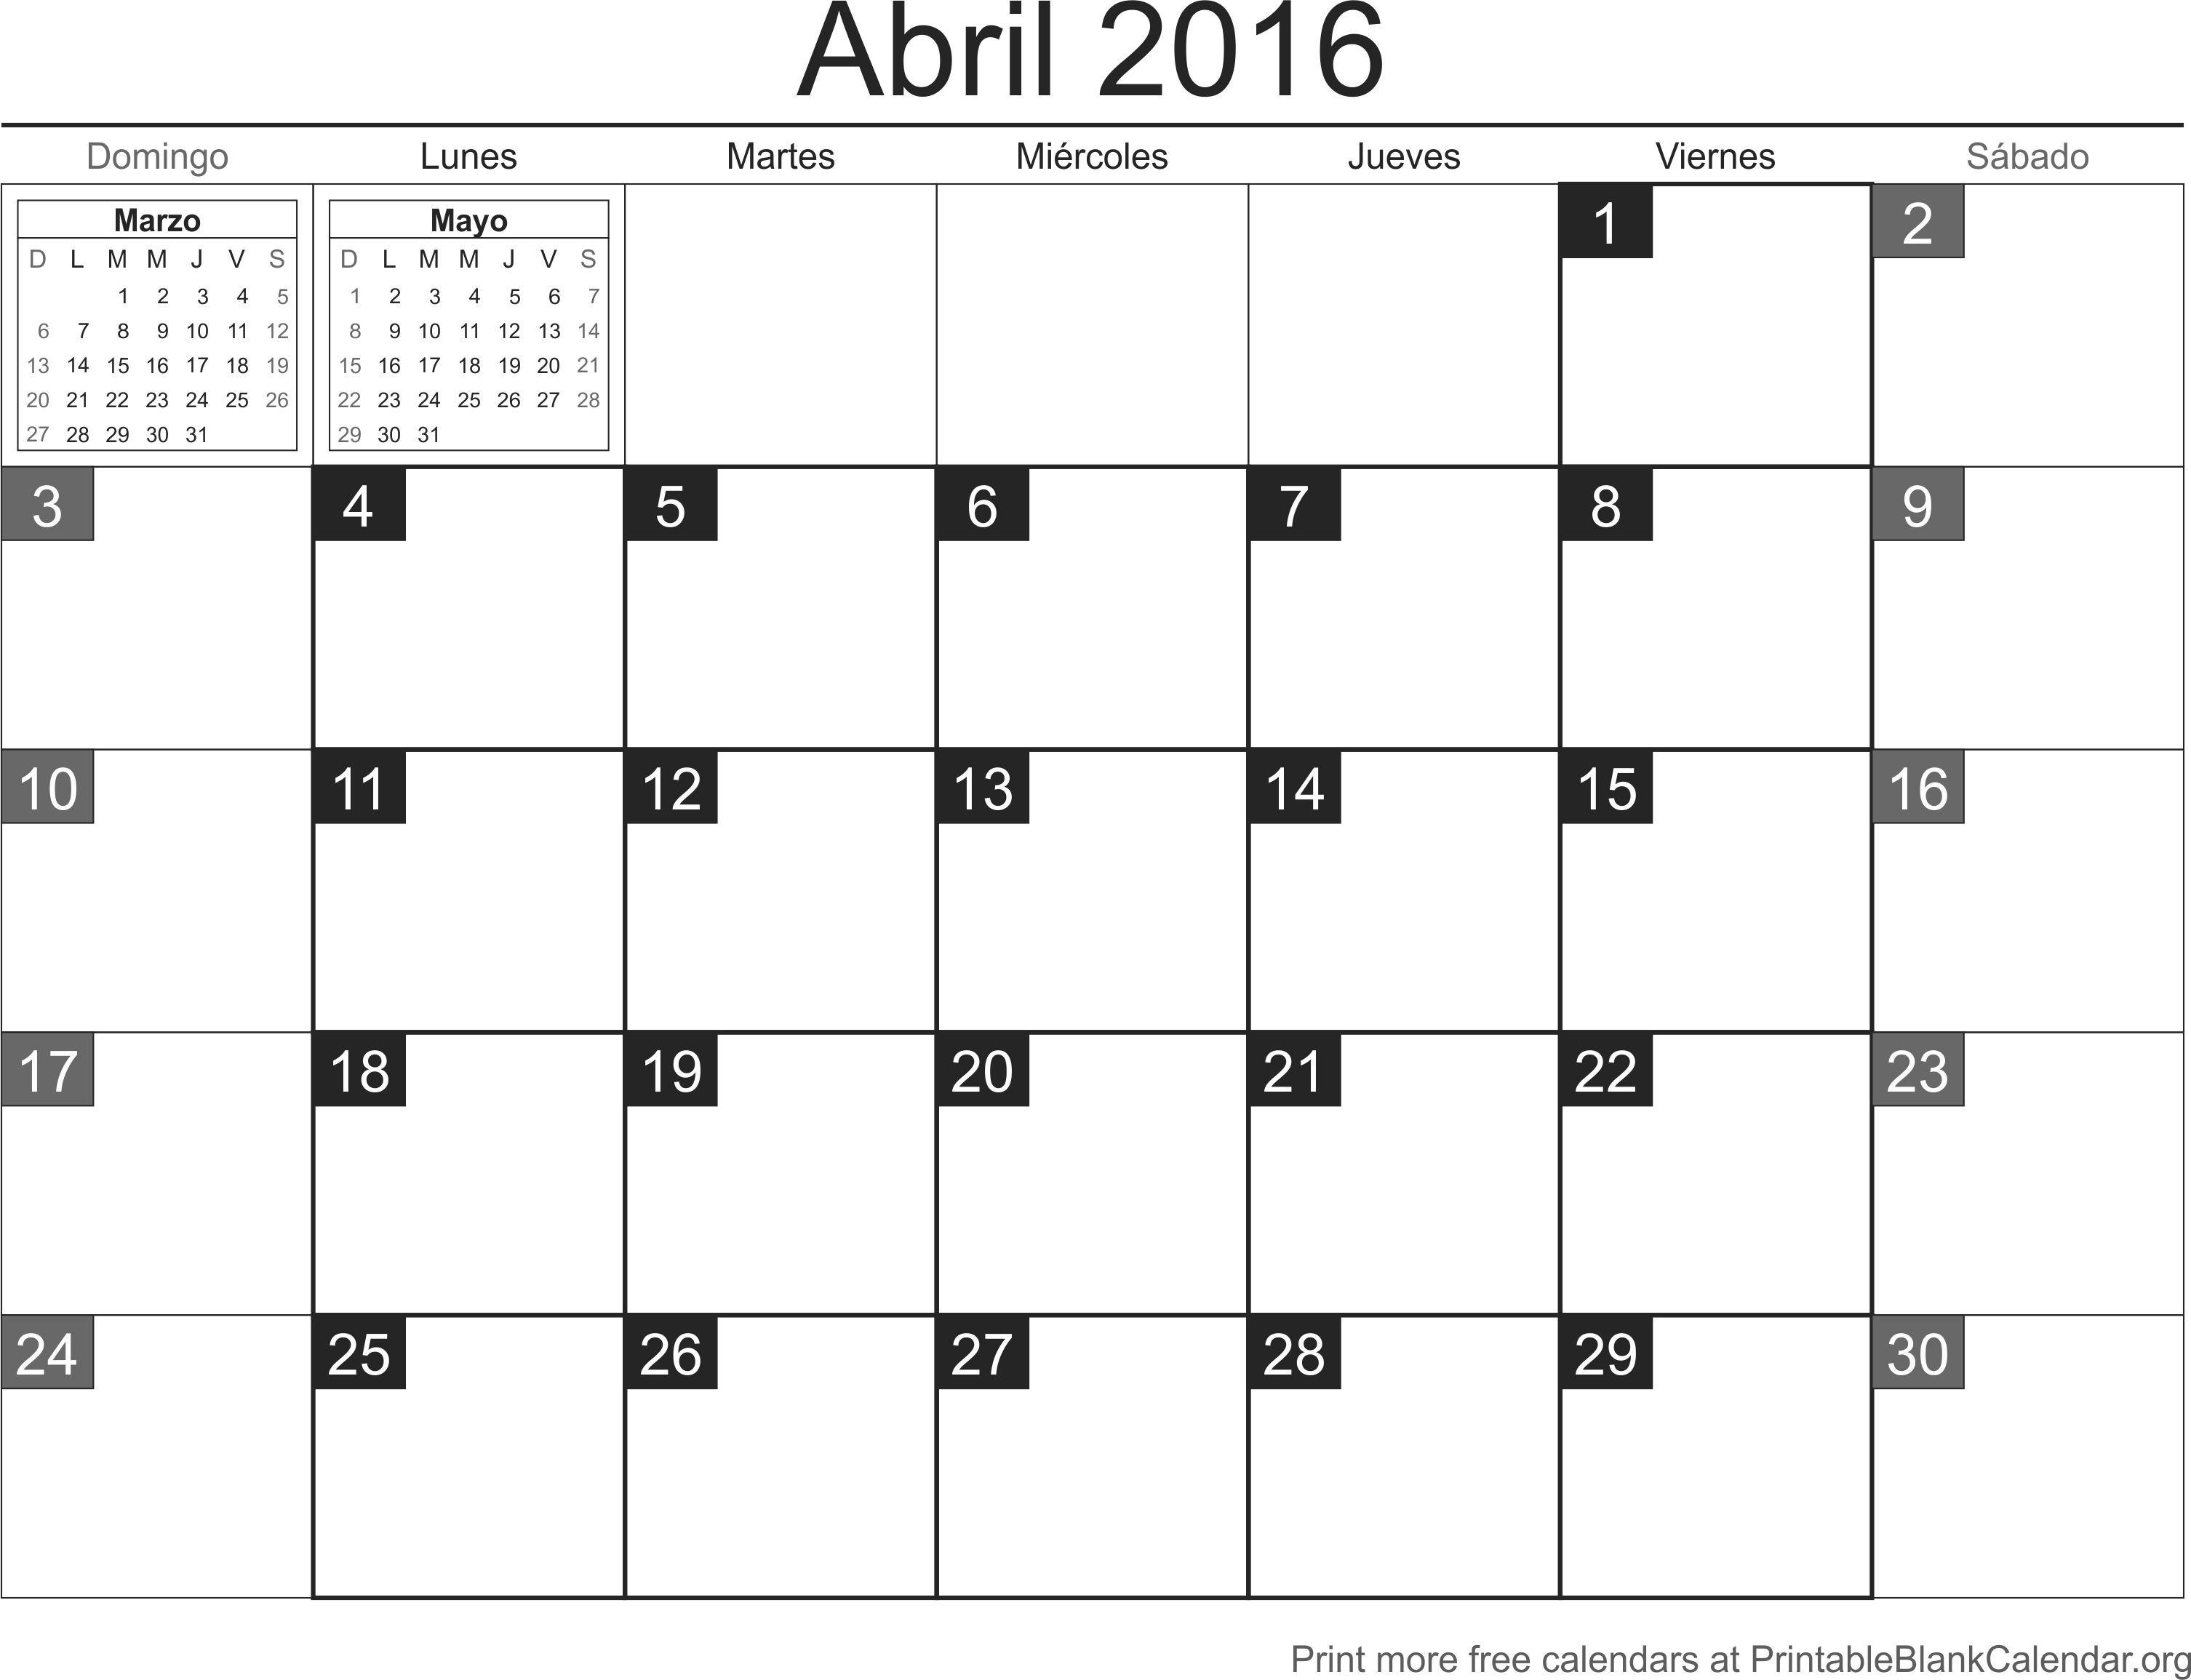 Calendario 2019 Colombia Editable Recientes Calendarios 2016 Para Imprimir Calendario Abril 2016 Agenda Of Calendario 2019 Colombia Editable Más Recientes Calendario 2017 Para Imprimir Icalendario Net – the Newninthprecinct